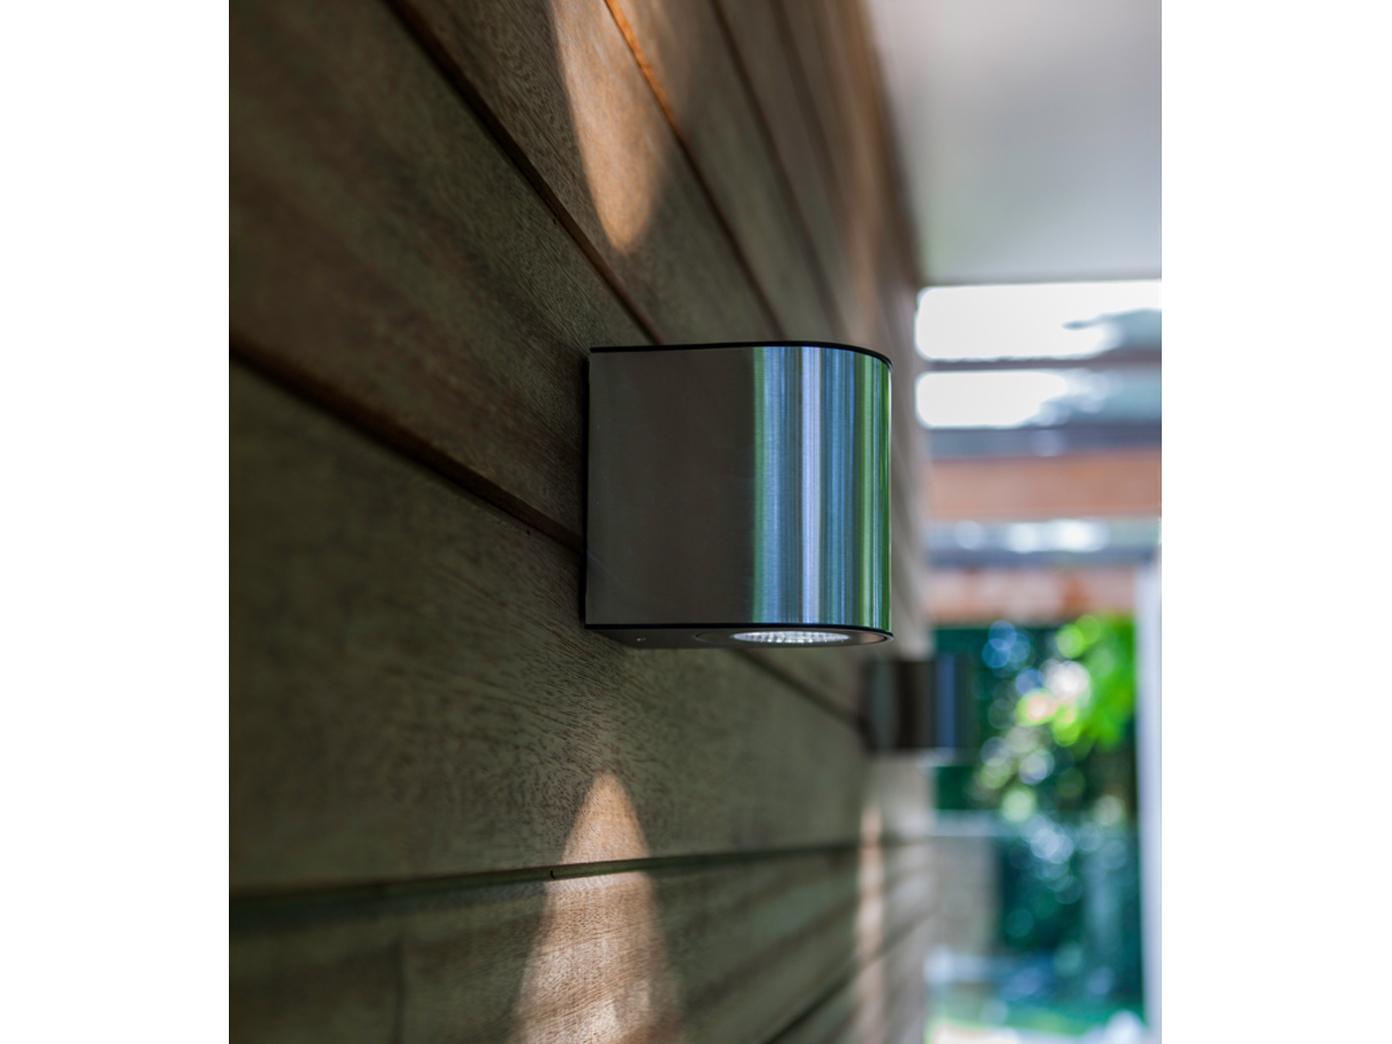 Lampada ESTERNO PARETE LED IN ACCIAIO INOX UP & Downlight H. 13,5cm ip54 vie Lampada da giardino